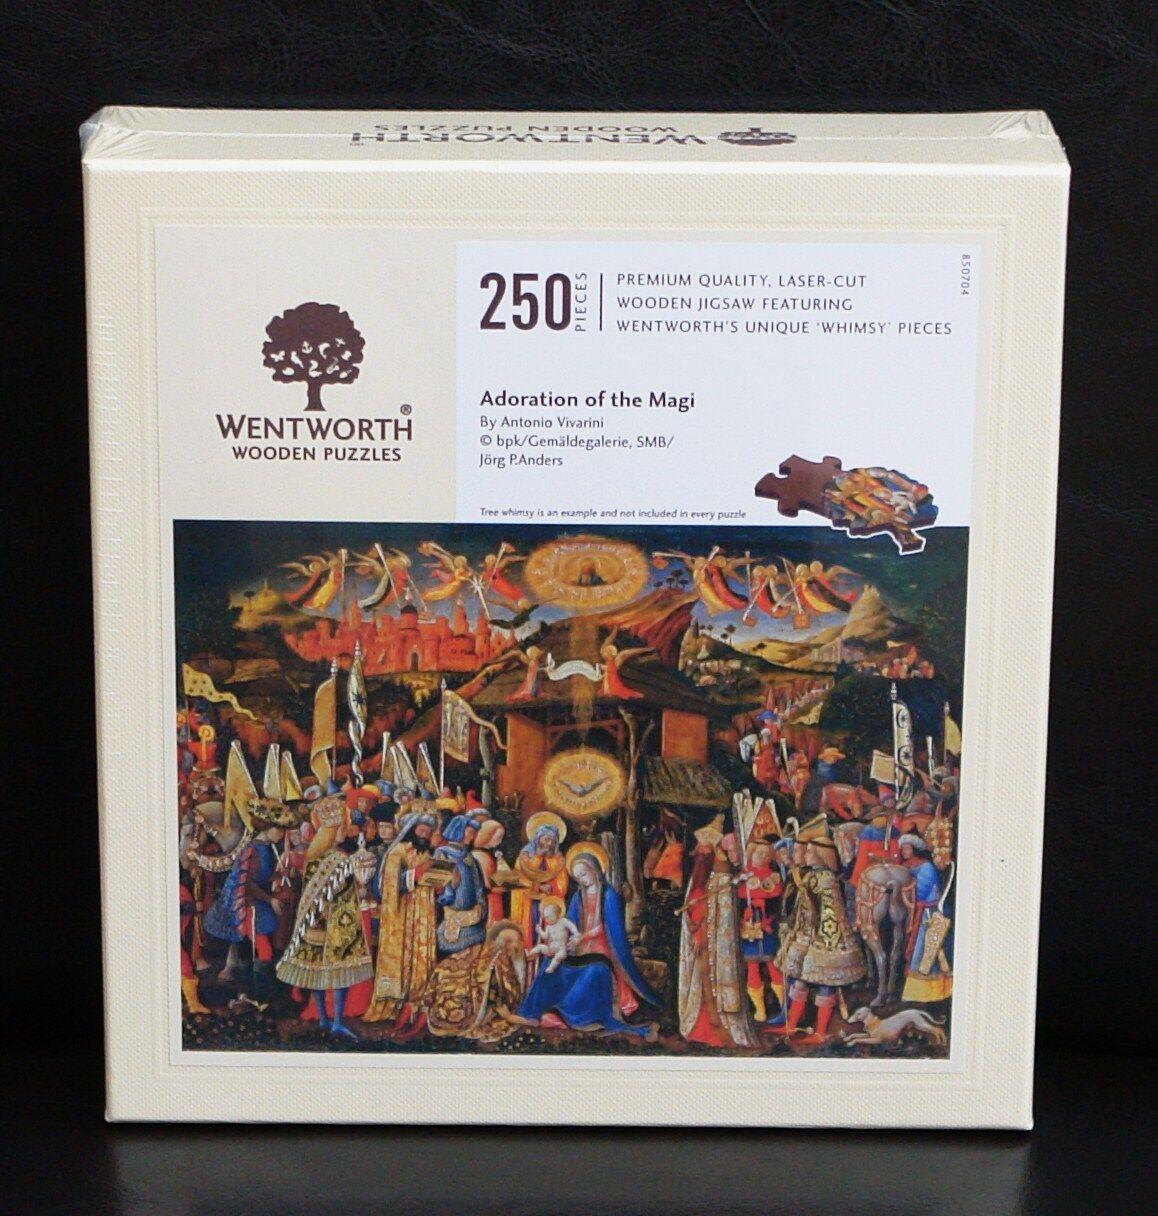 WENTWORTH WOODEN JIGSAW PUZZLE 250 PIECE ADORATION OF THE MAGI ANTONIO VIVARINI